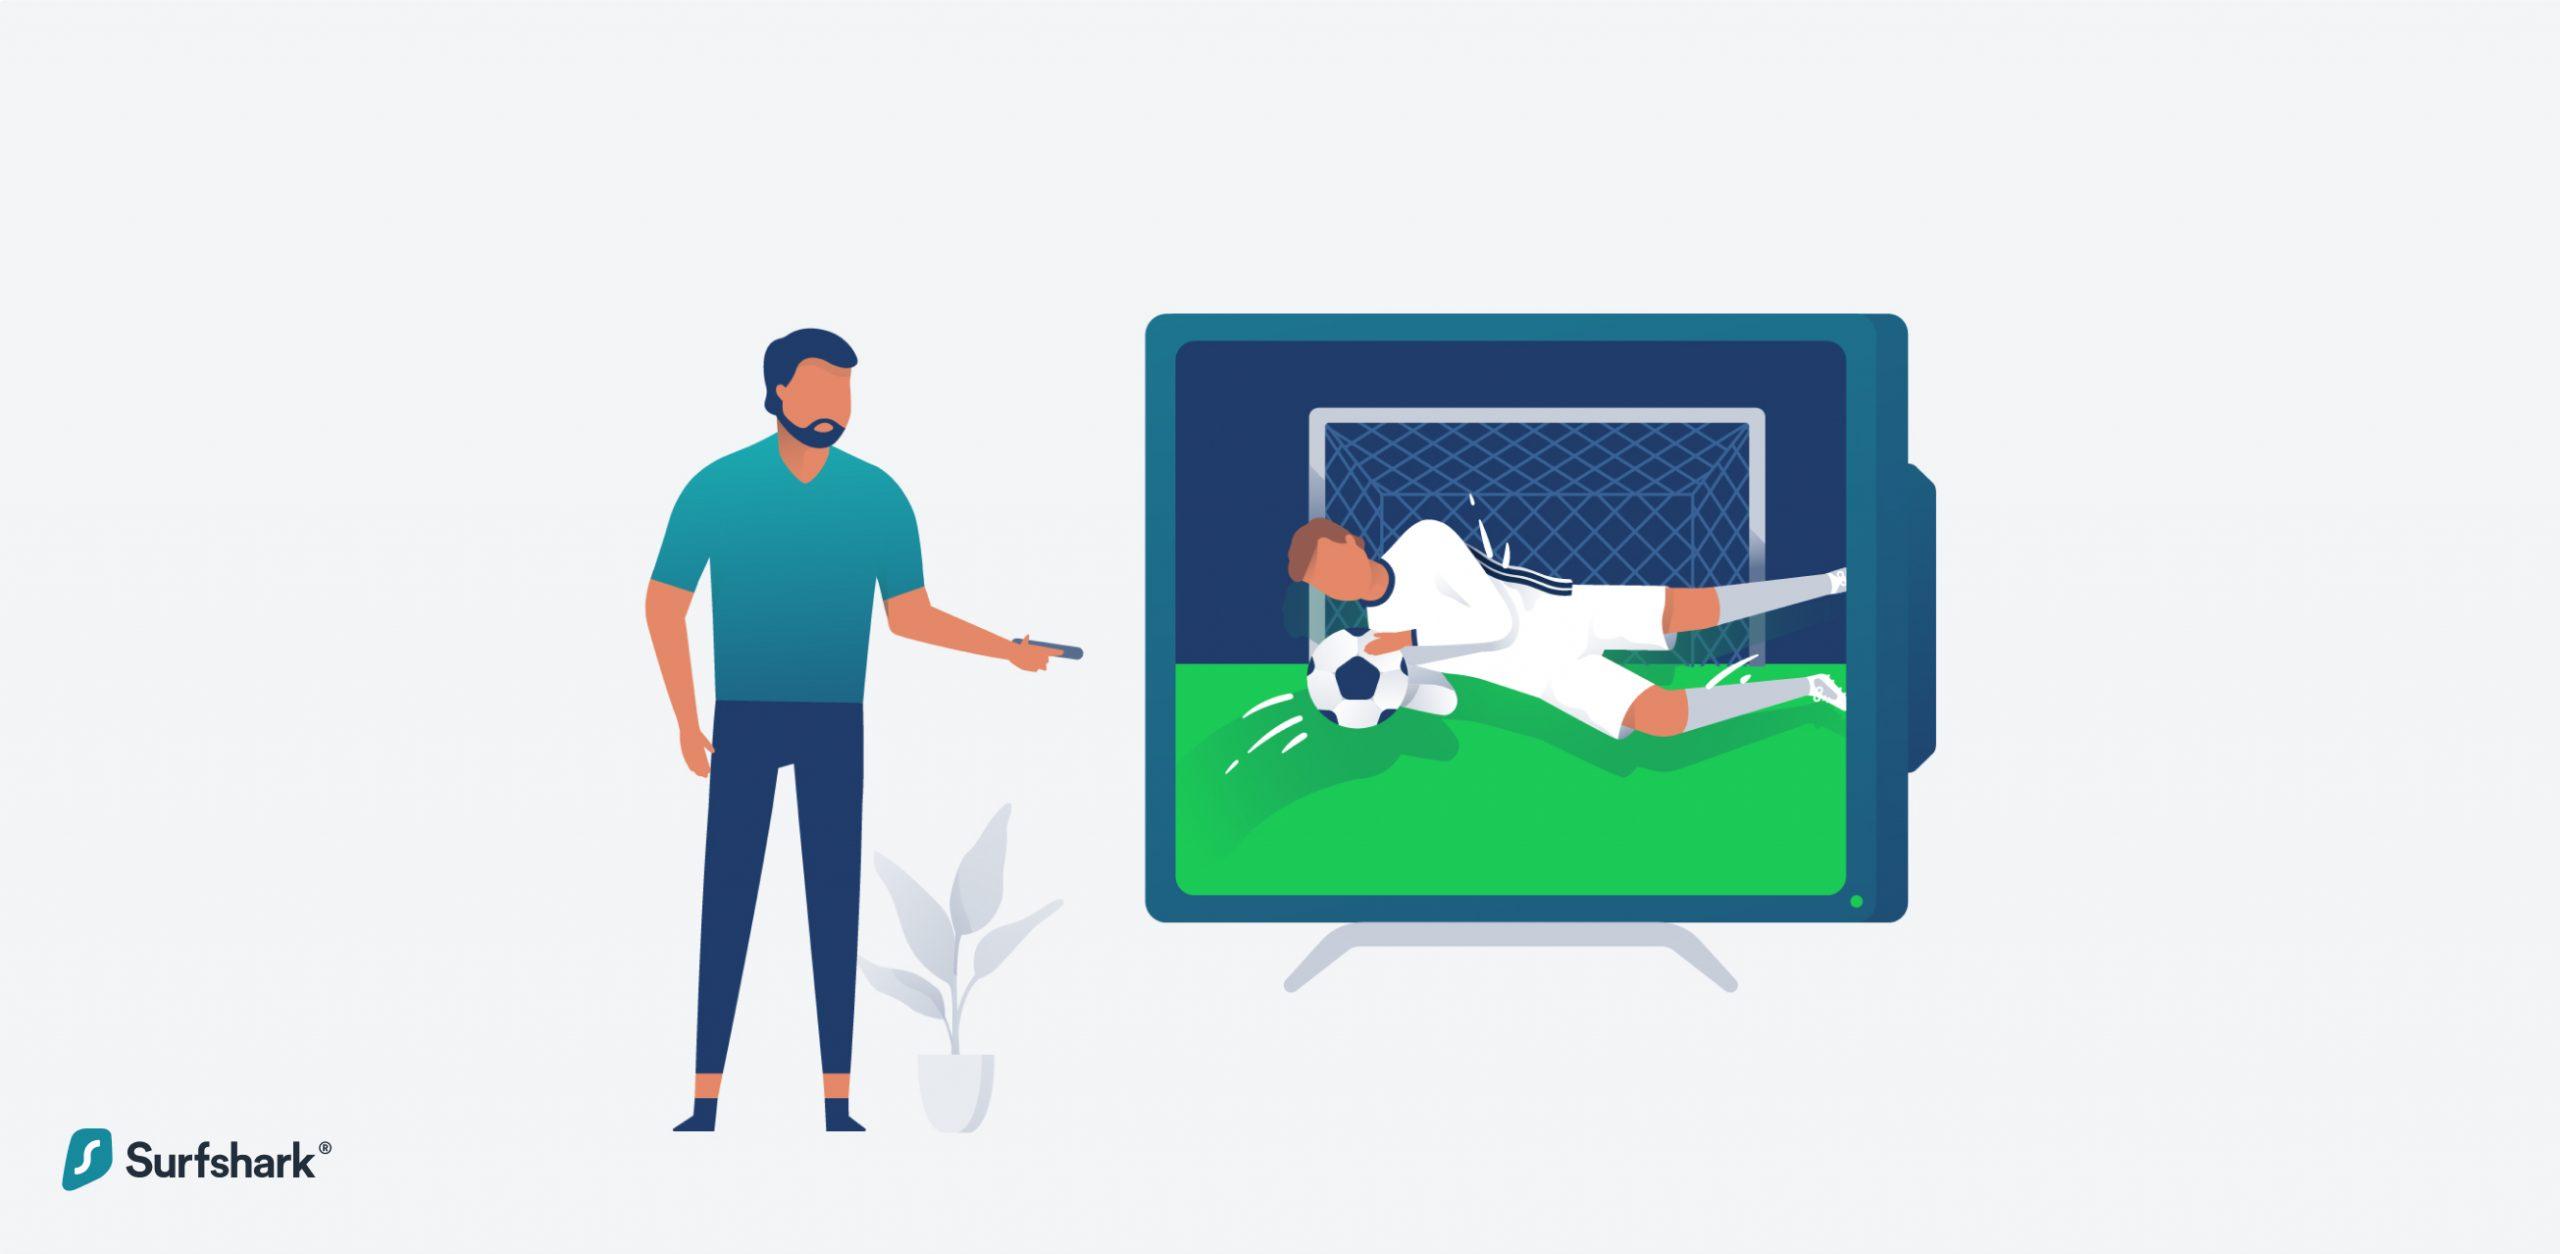 Surfshark sports streaming graphic